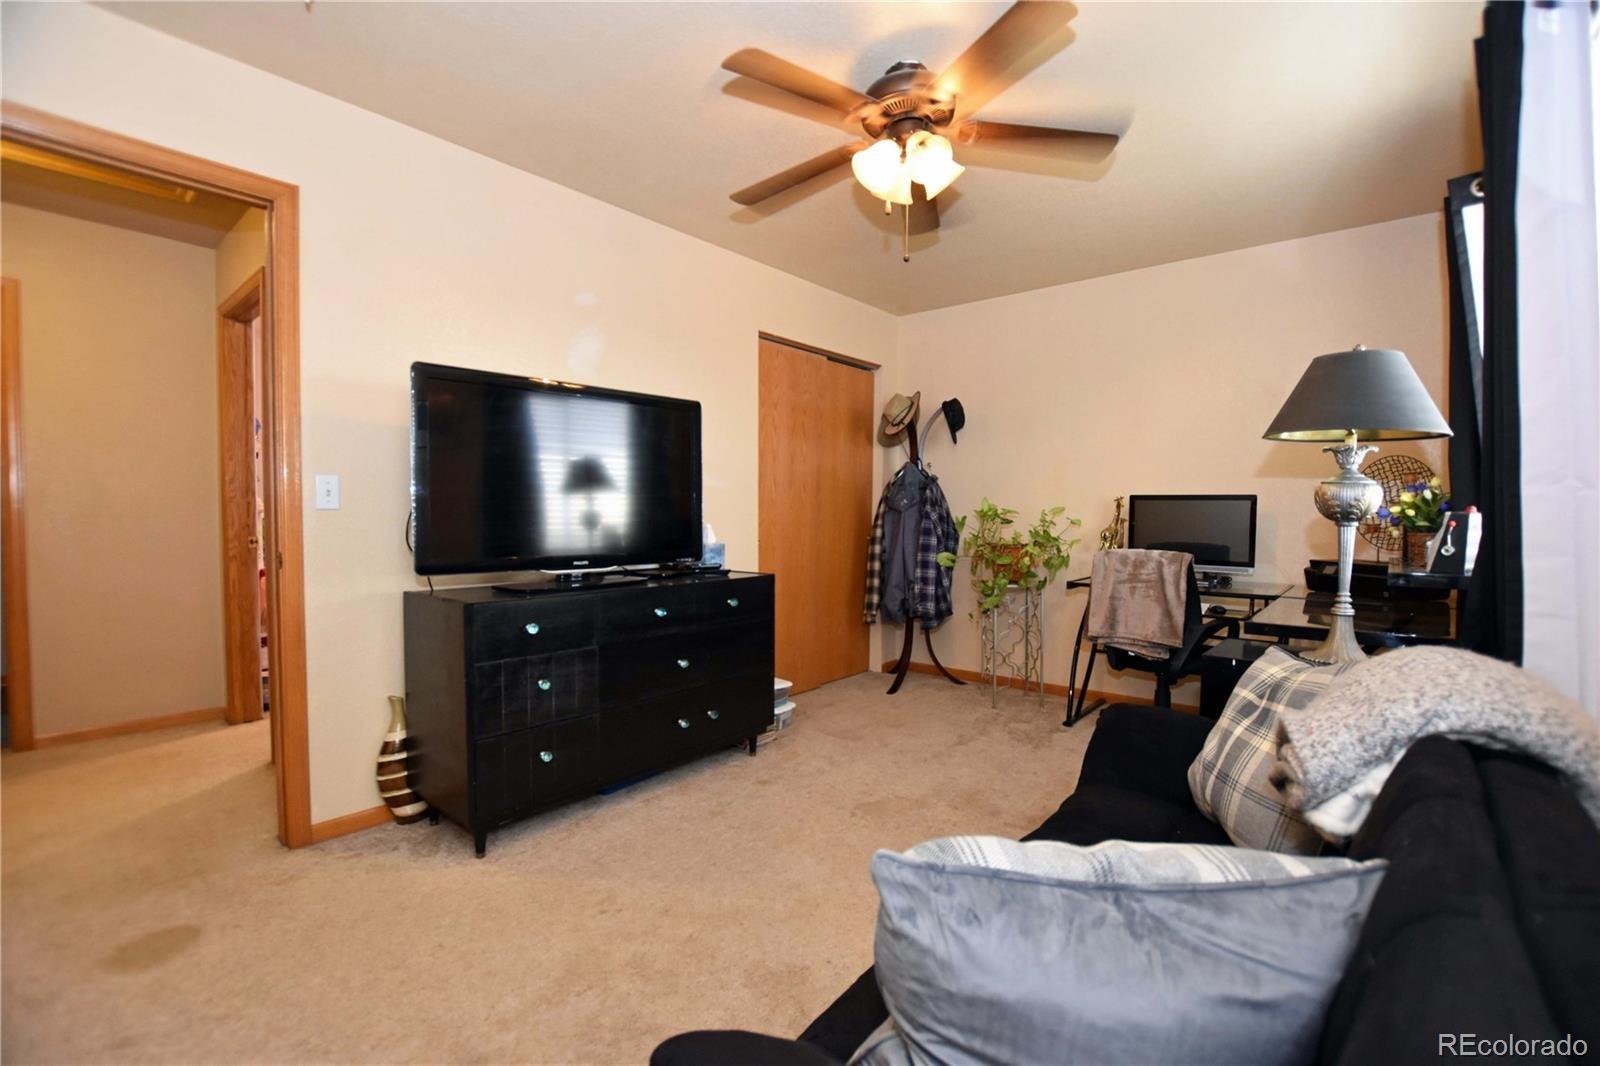 MLS# 9206879 - 27 - 3924 Eagles Nest Drive, Evans, CO 80620